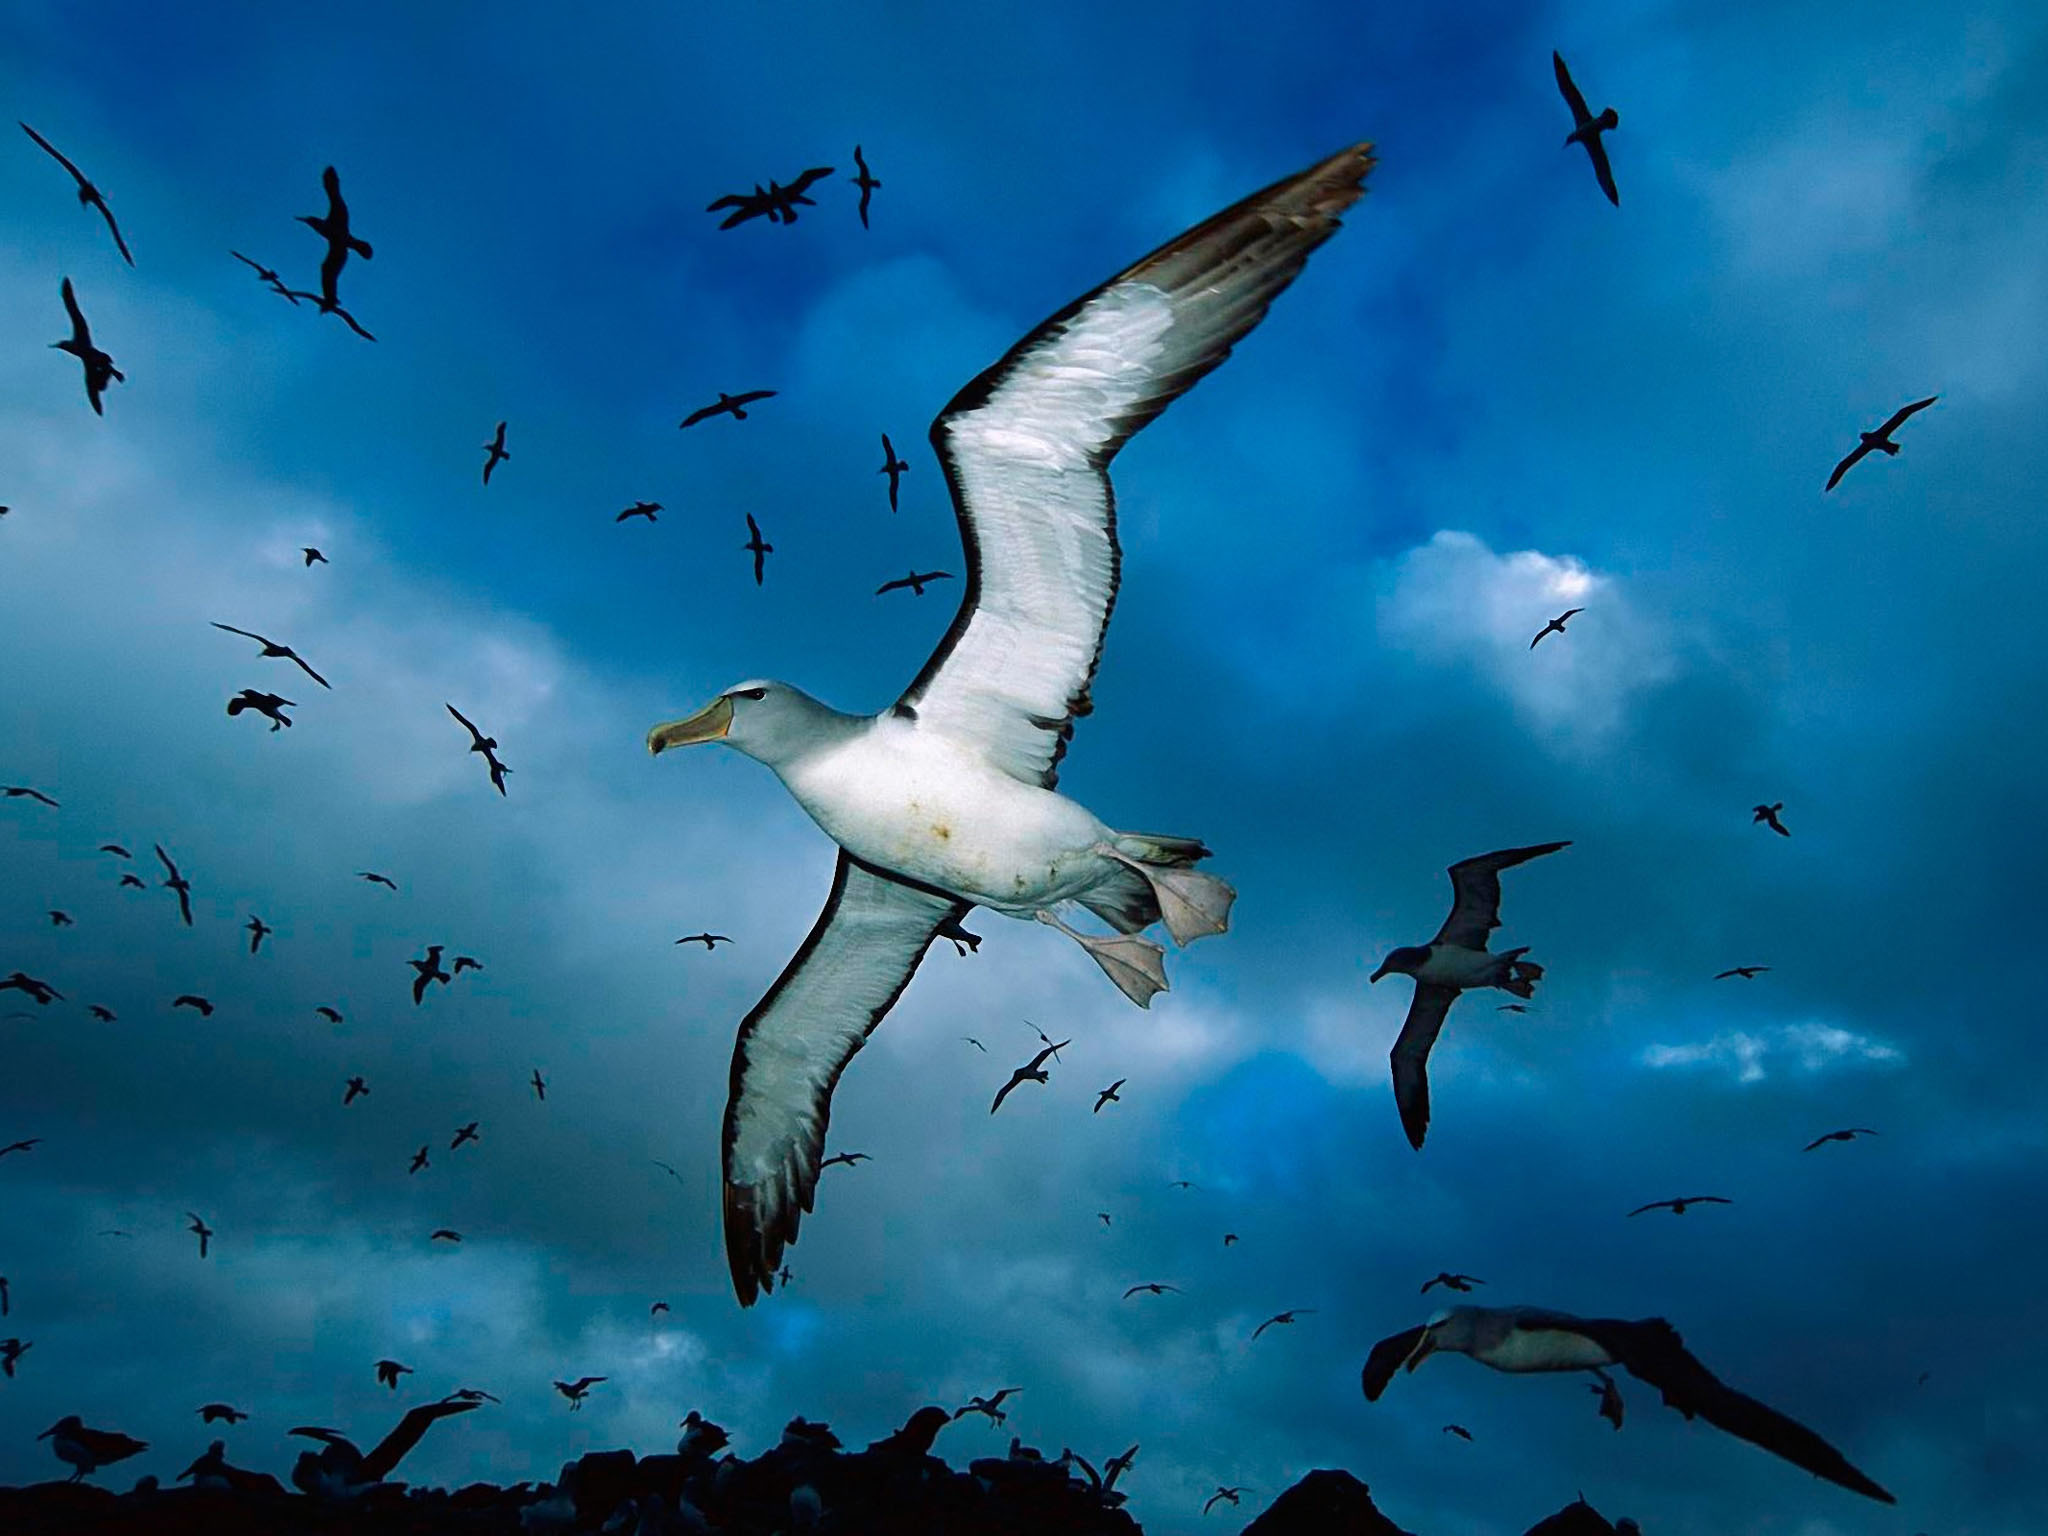 Flying Birds Apple Animals Blue Sky Hd Wallpaper - Flying Animals In The Sky , HD Wallpaper & Backgrounds